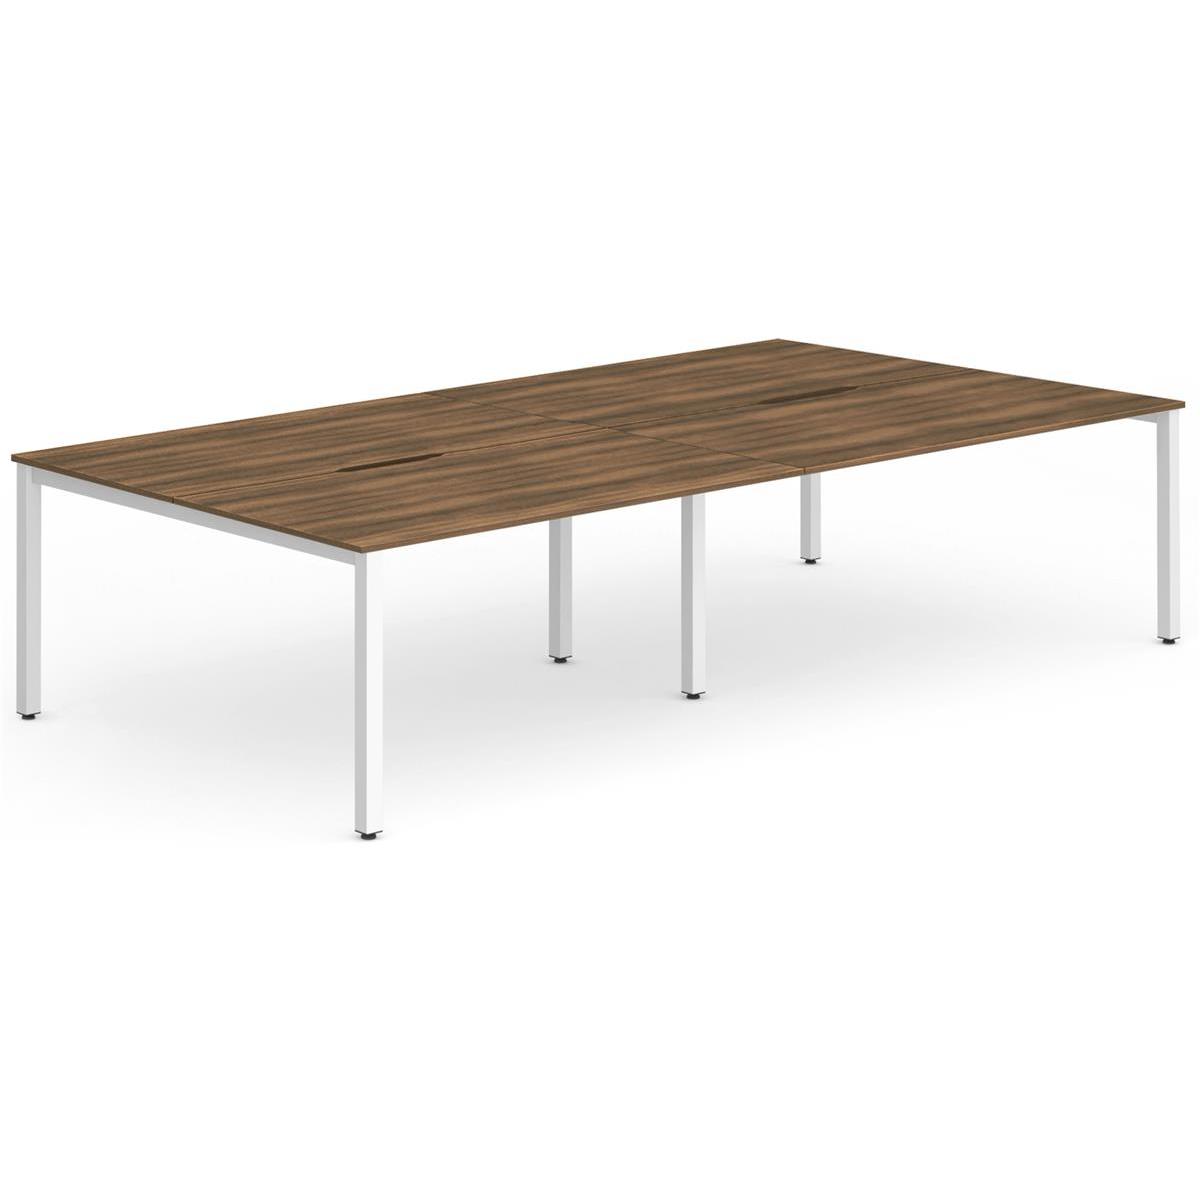 Trexus Bench Desk 4 Person Back to Back Configuration White Leg 2800x1600mm Walnut Ref BE234